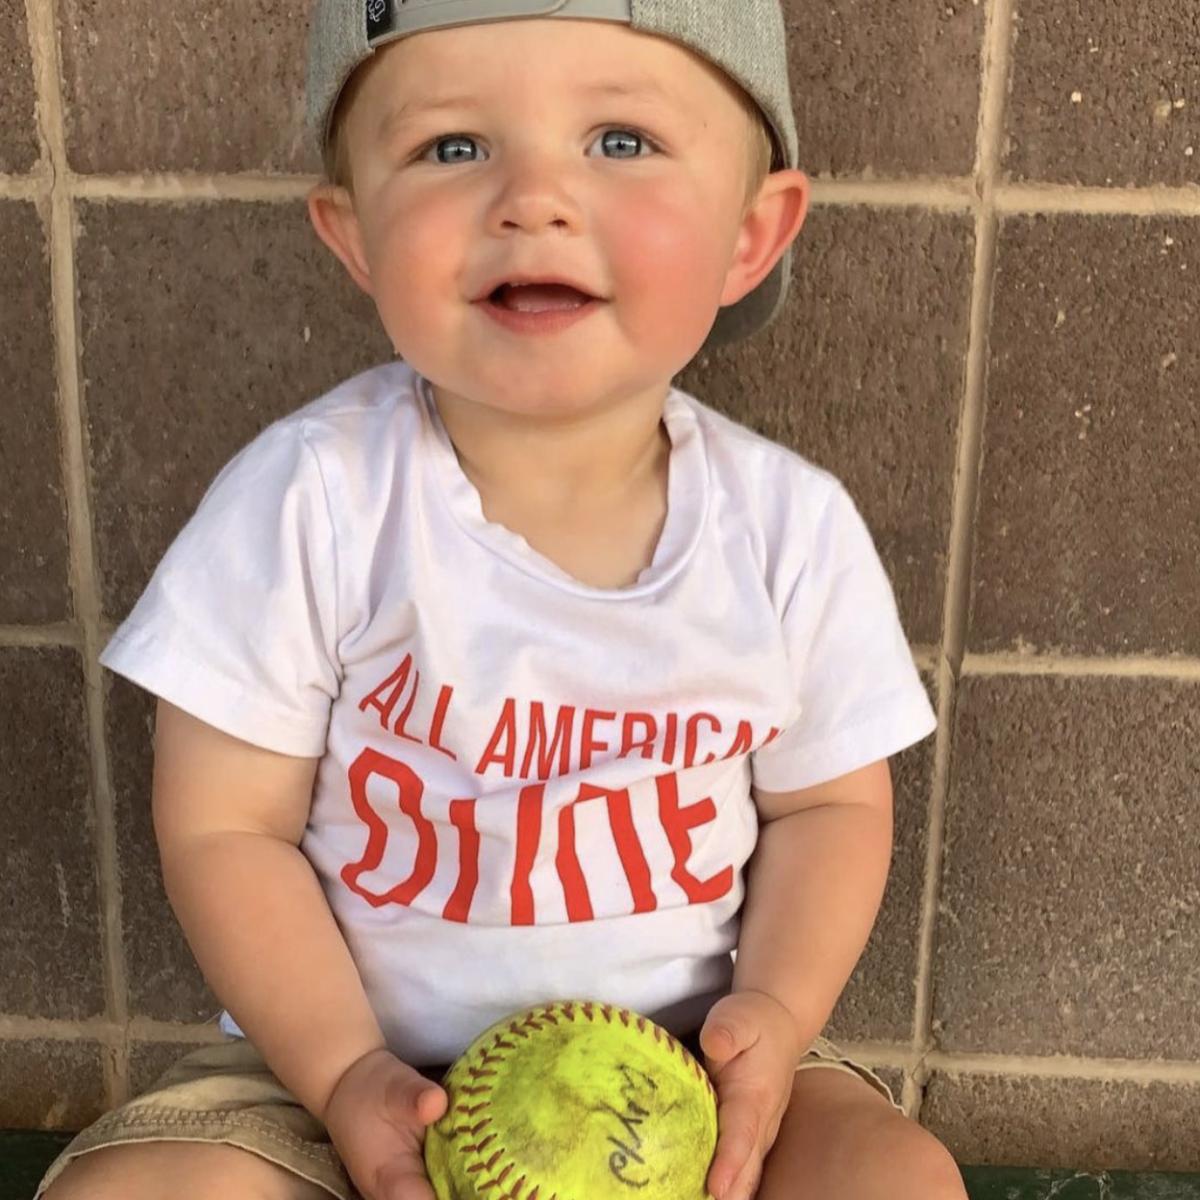 Baby holding a baseball